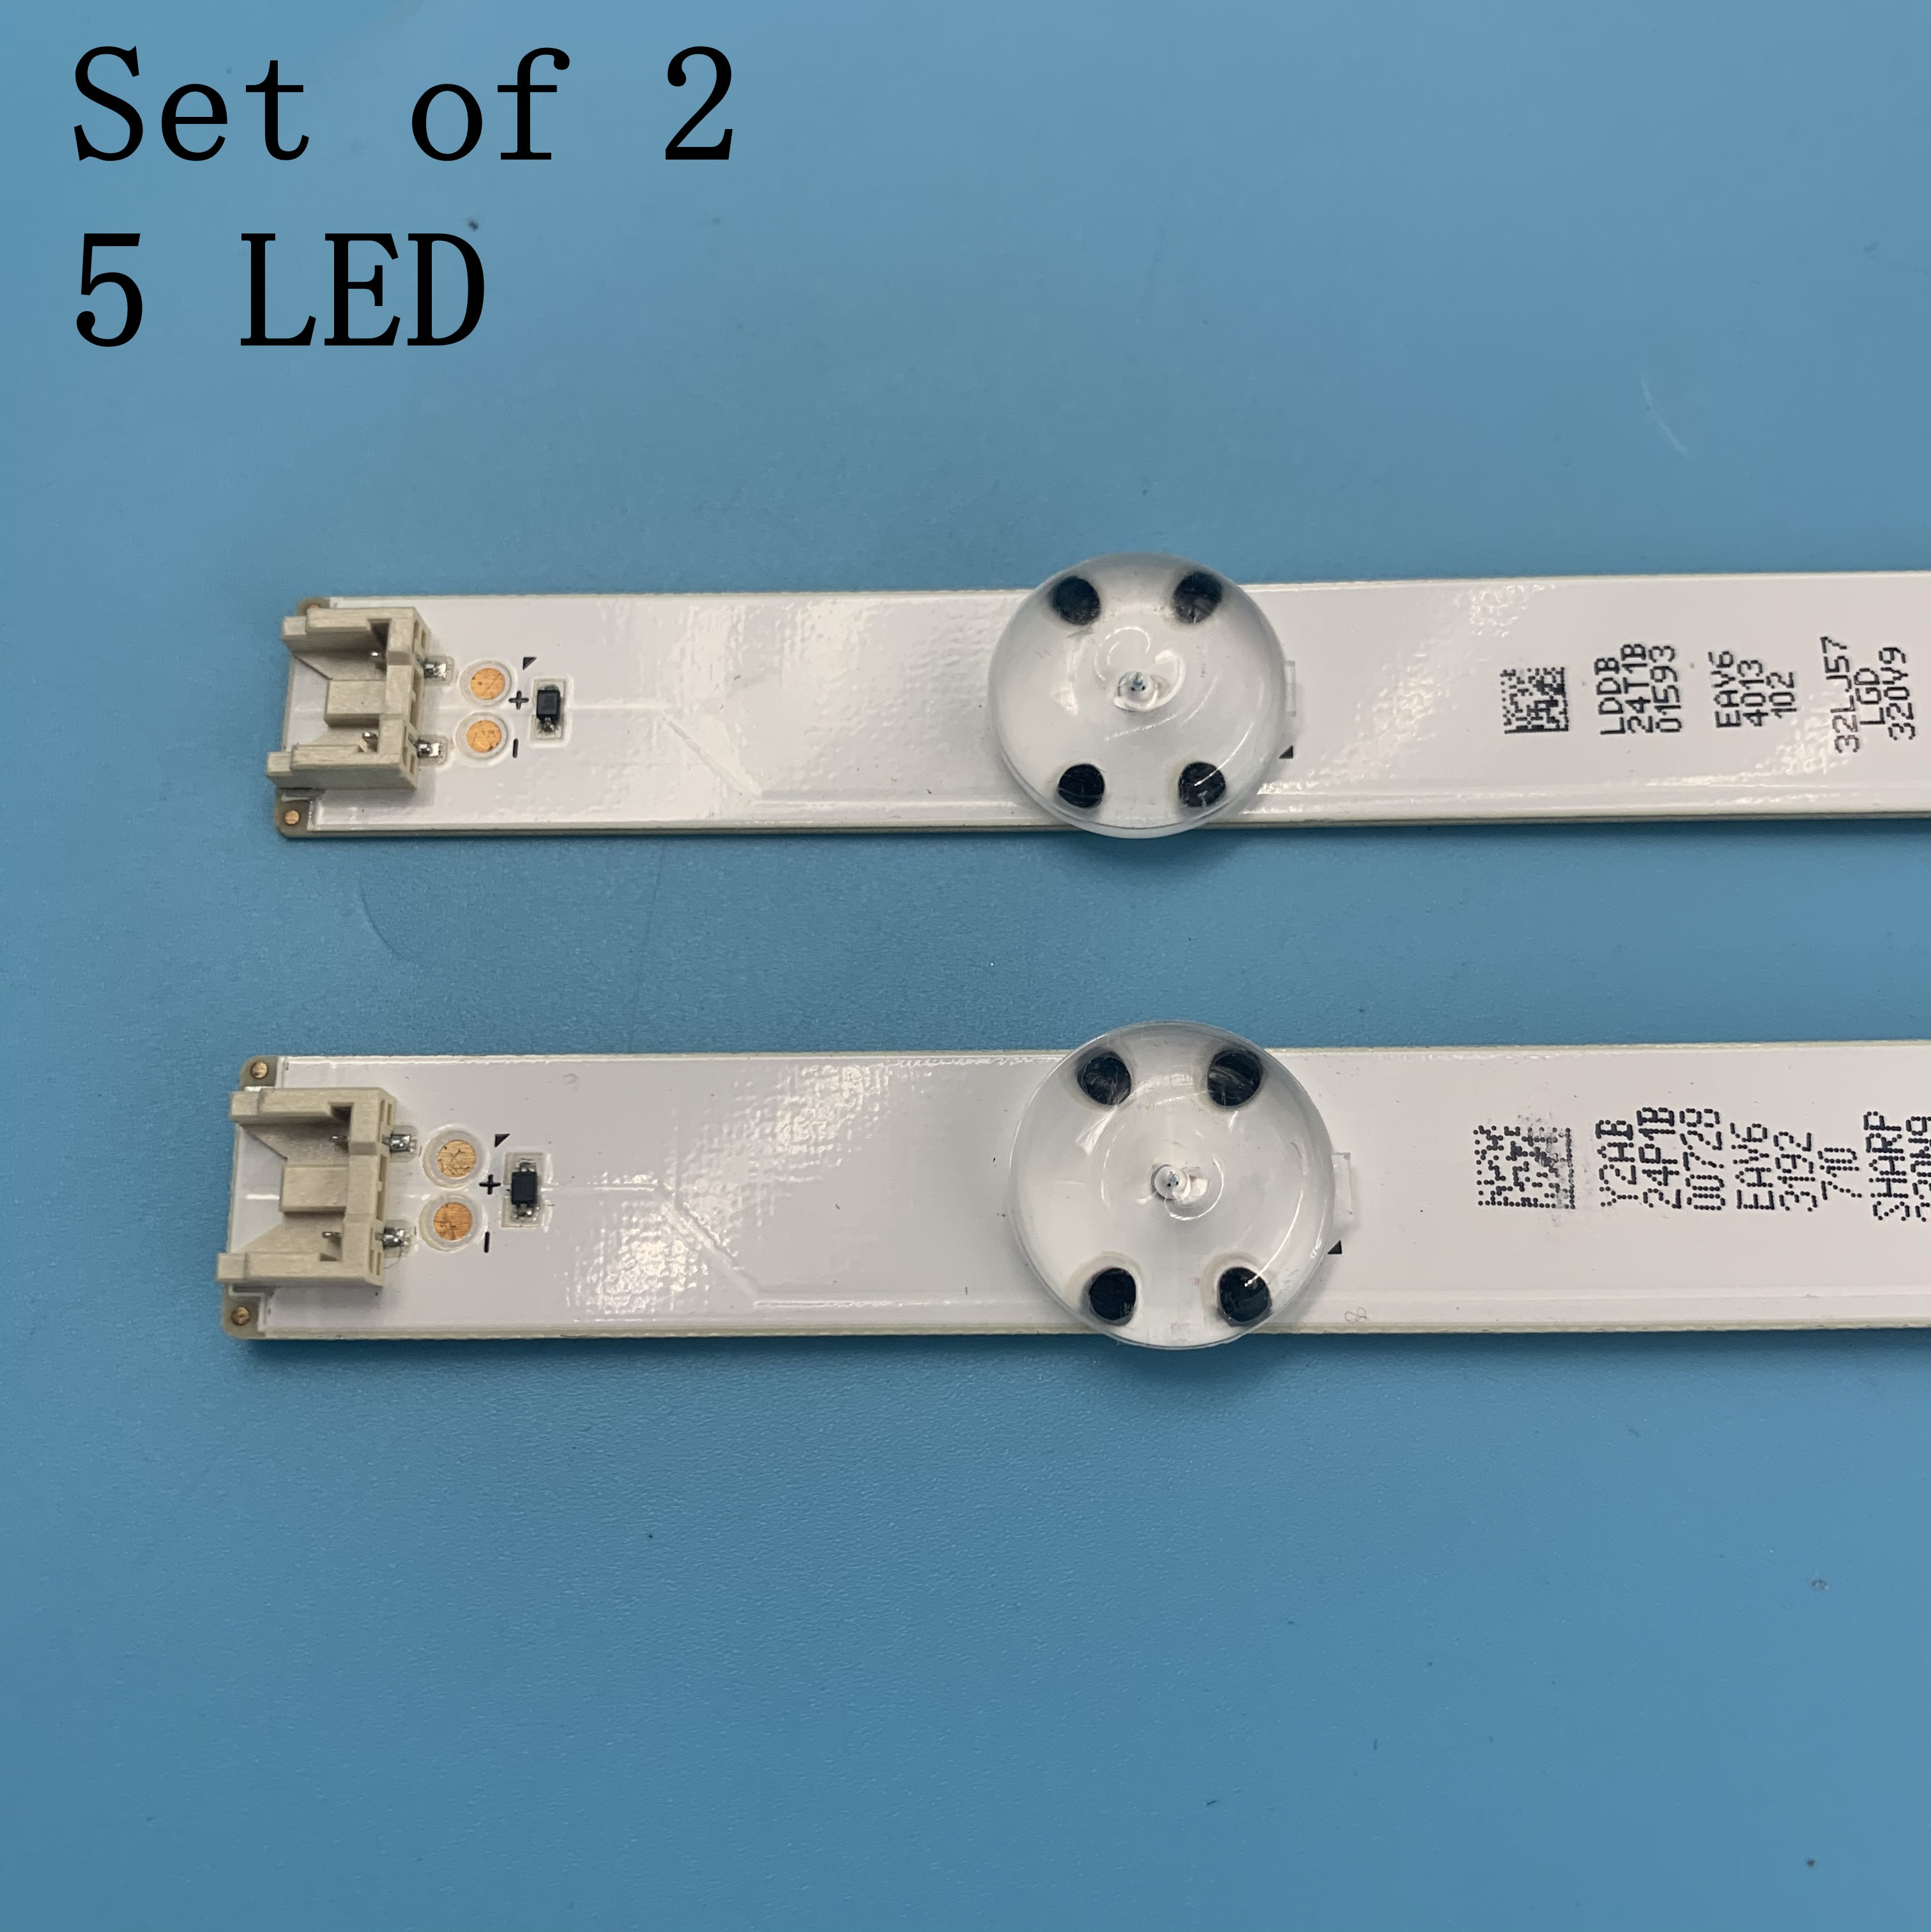 New 5 Lamps LED Backlight Strip For LG 32LH562A 32LH564A 32LH565B 32LH570B 32LH570D 32LH570U Bars Ki